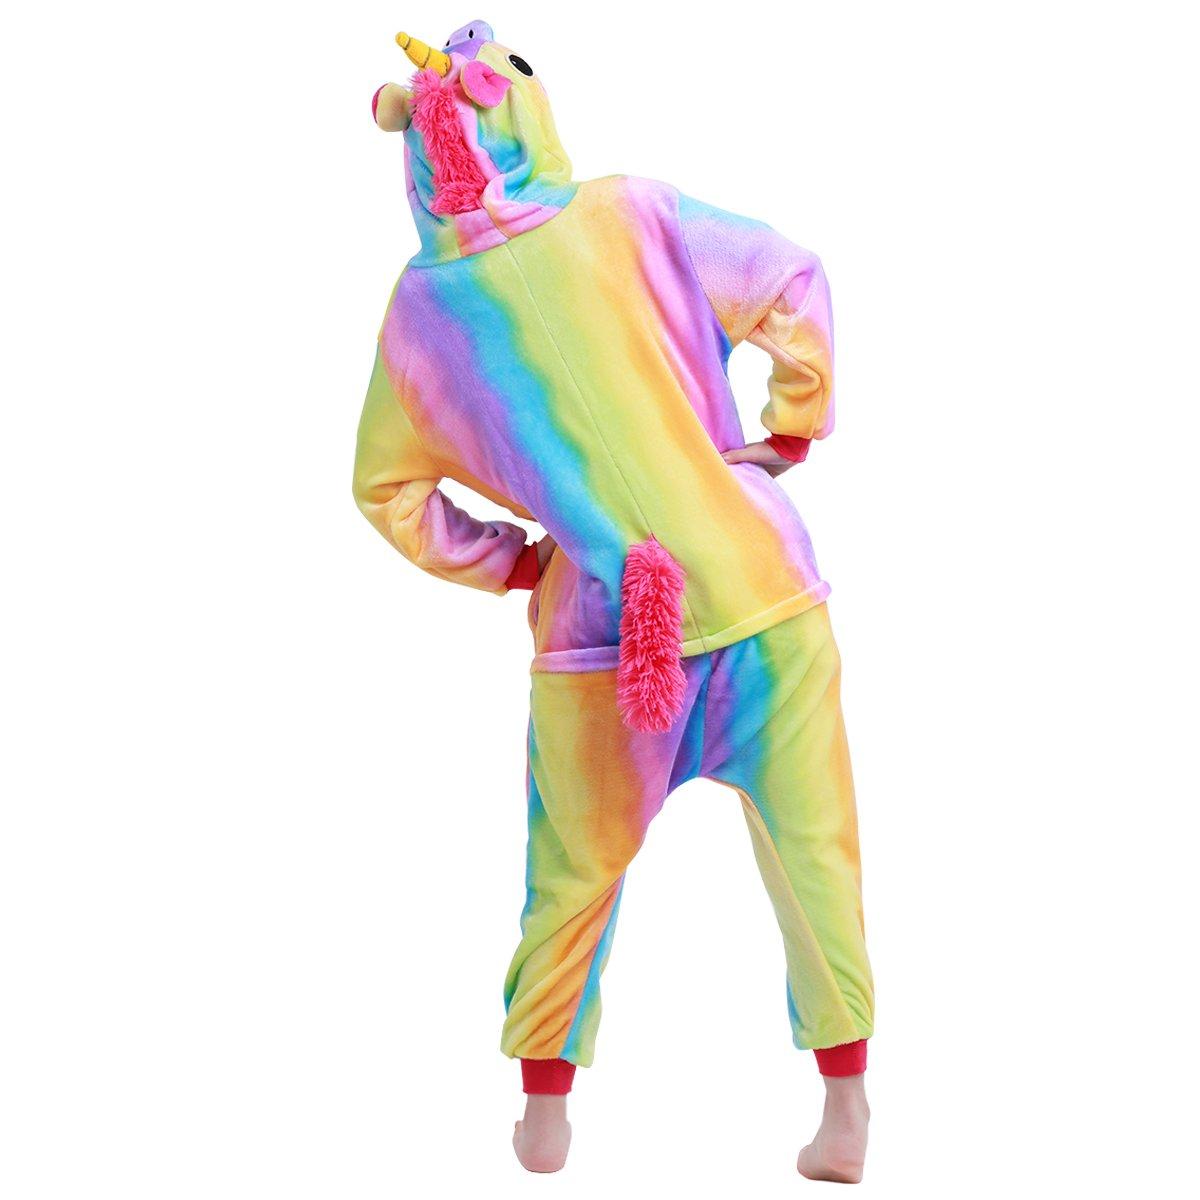 FEESHOW Kids Boys Girls One Piece Cartoon Pajamas Cosplay Costume Animal Plush Hoodie Sleepwear Rainbow 5-6